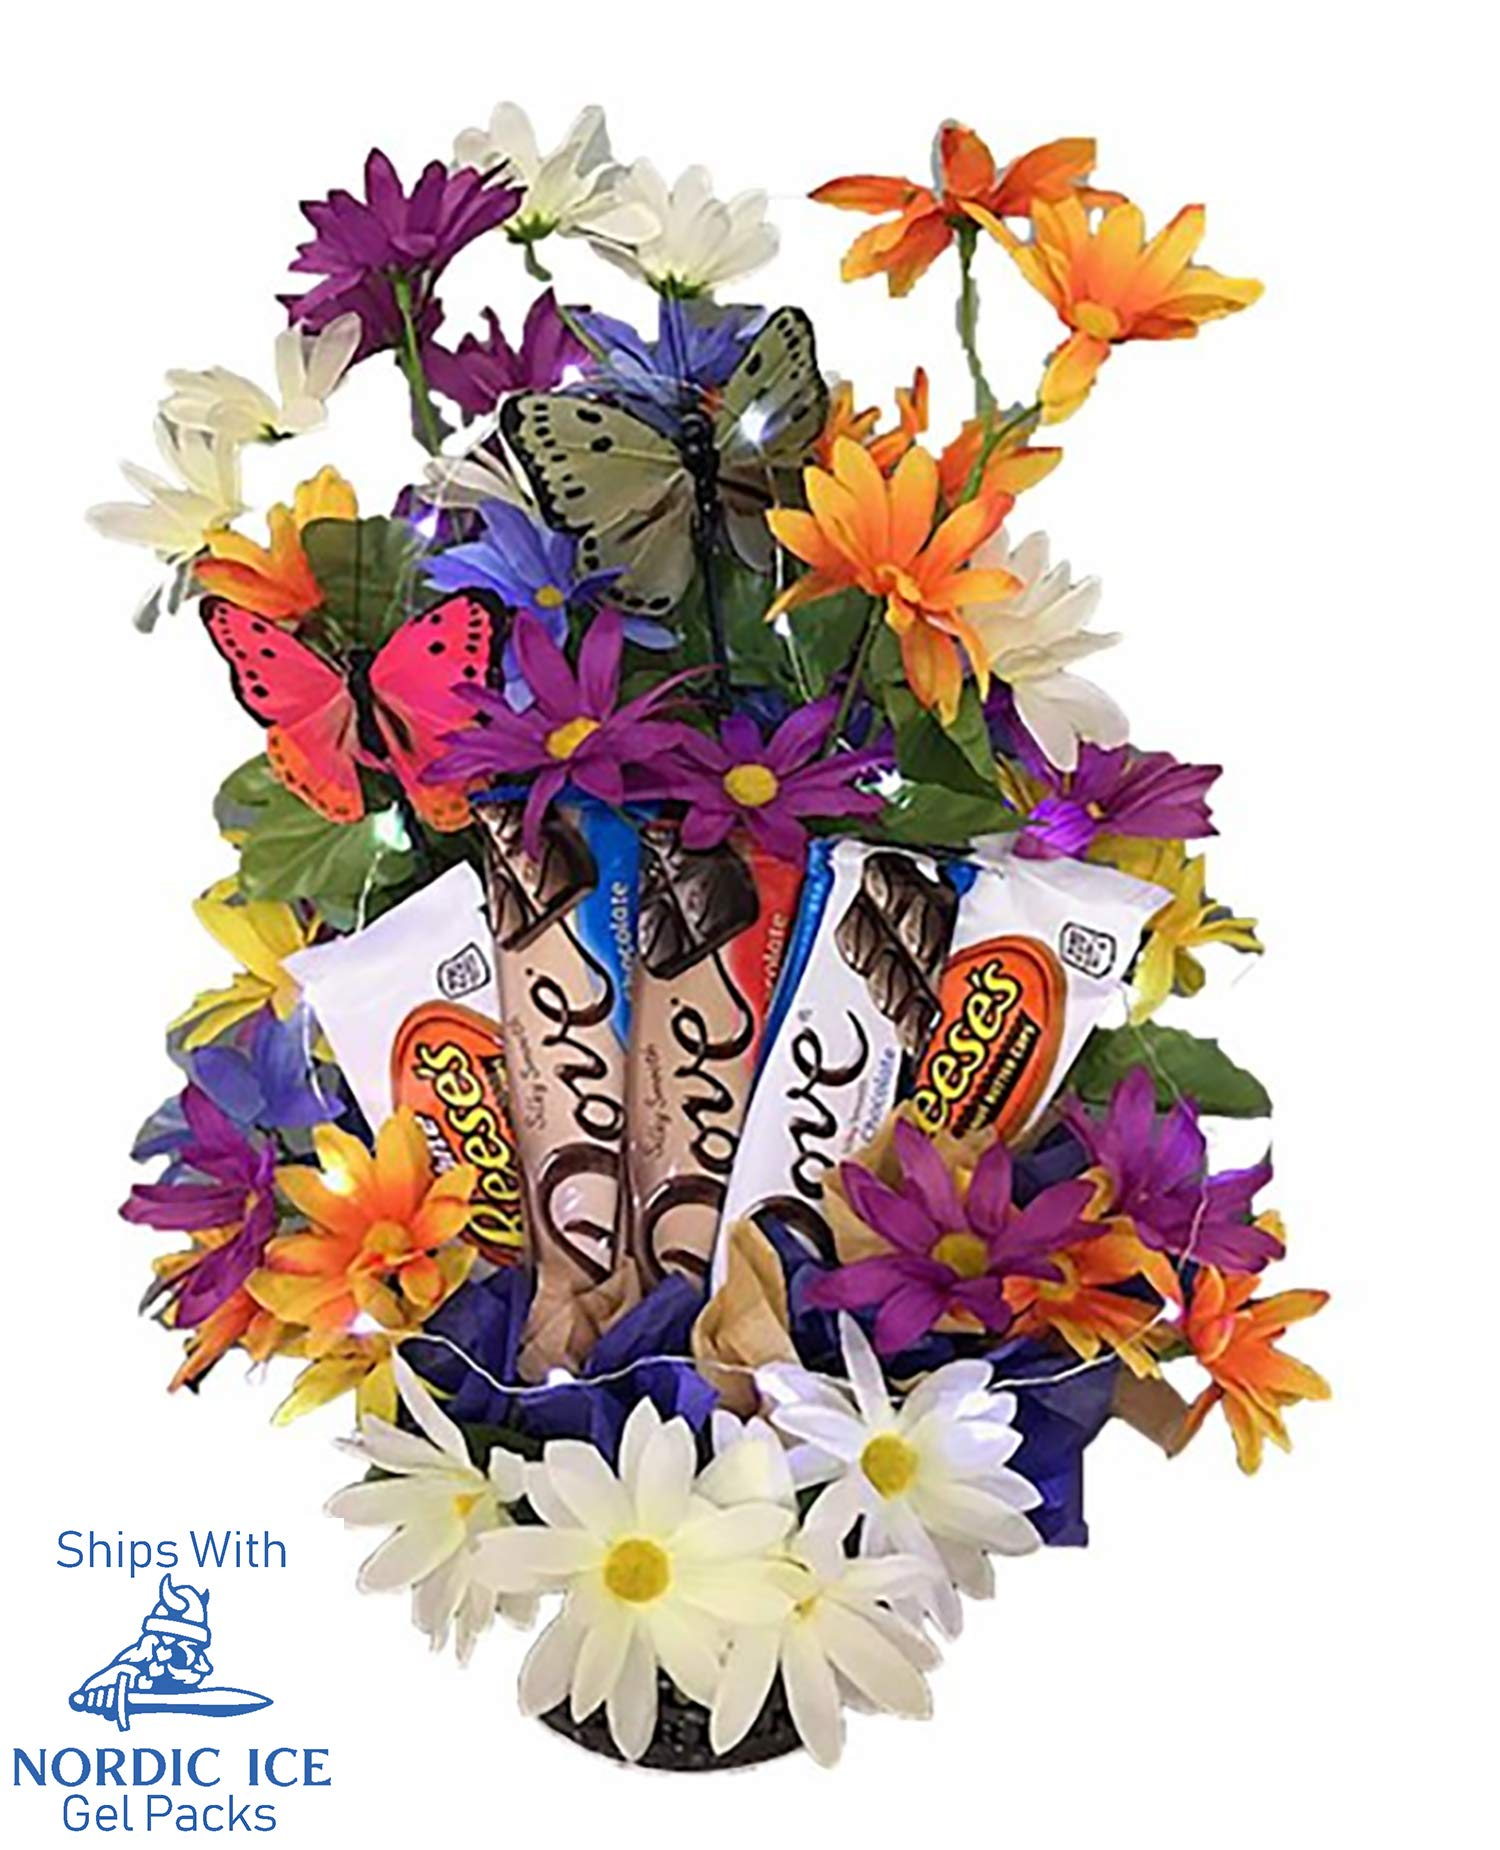 Online 24/7 LLC Unique Chocolate Candy Bouquet with Beautiful Artificial Flowers, Butterflies, Fairy Lights and Reusable Garden Pail.